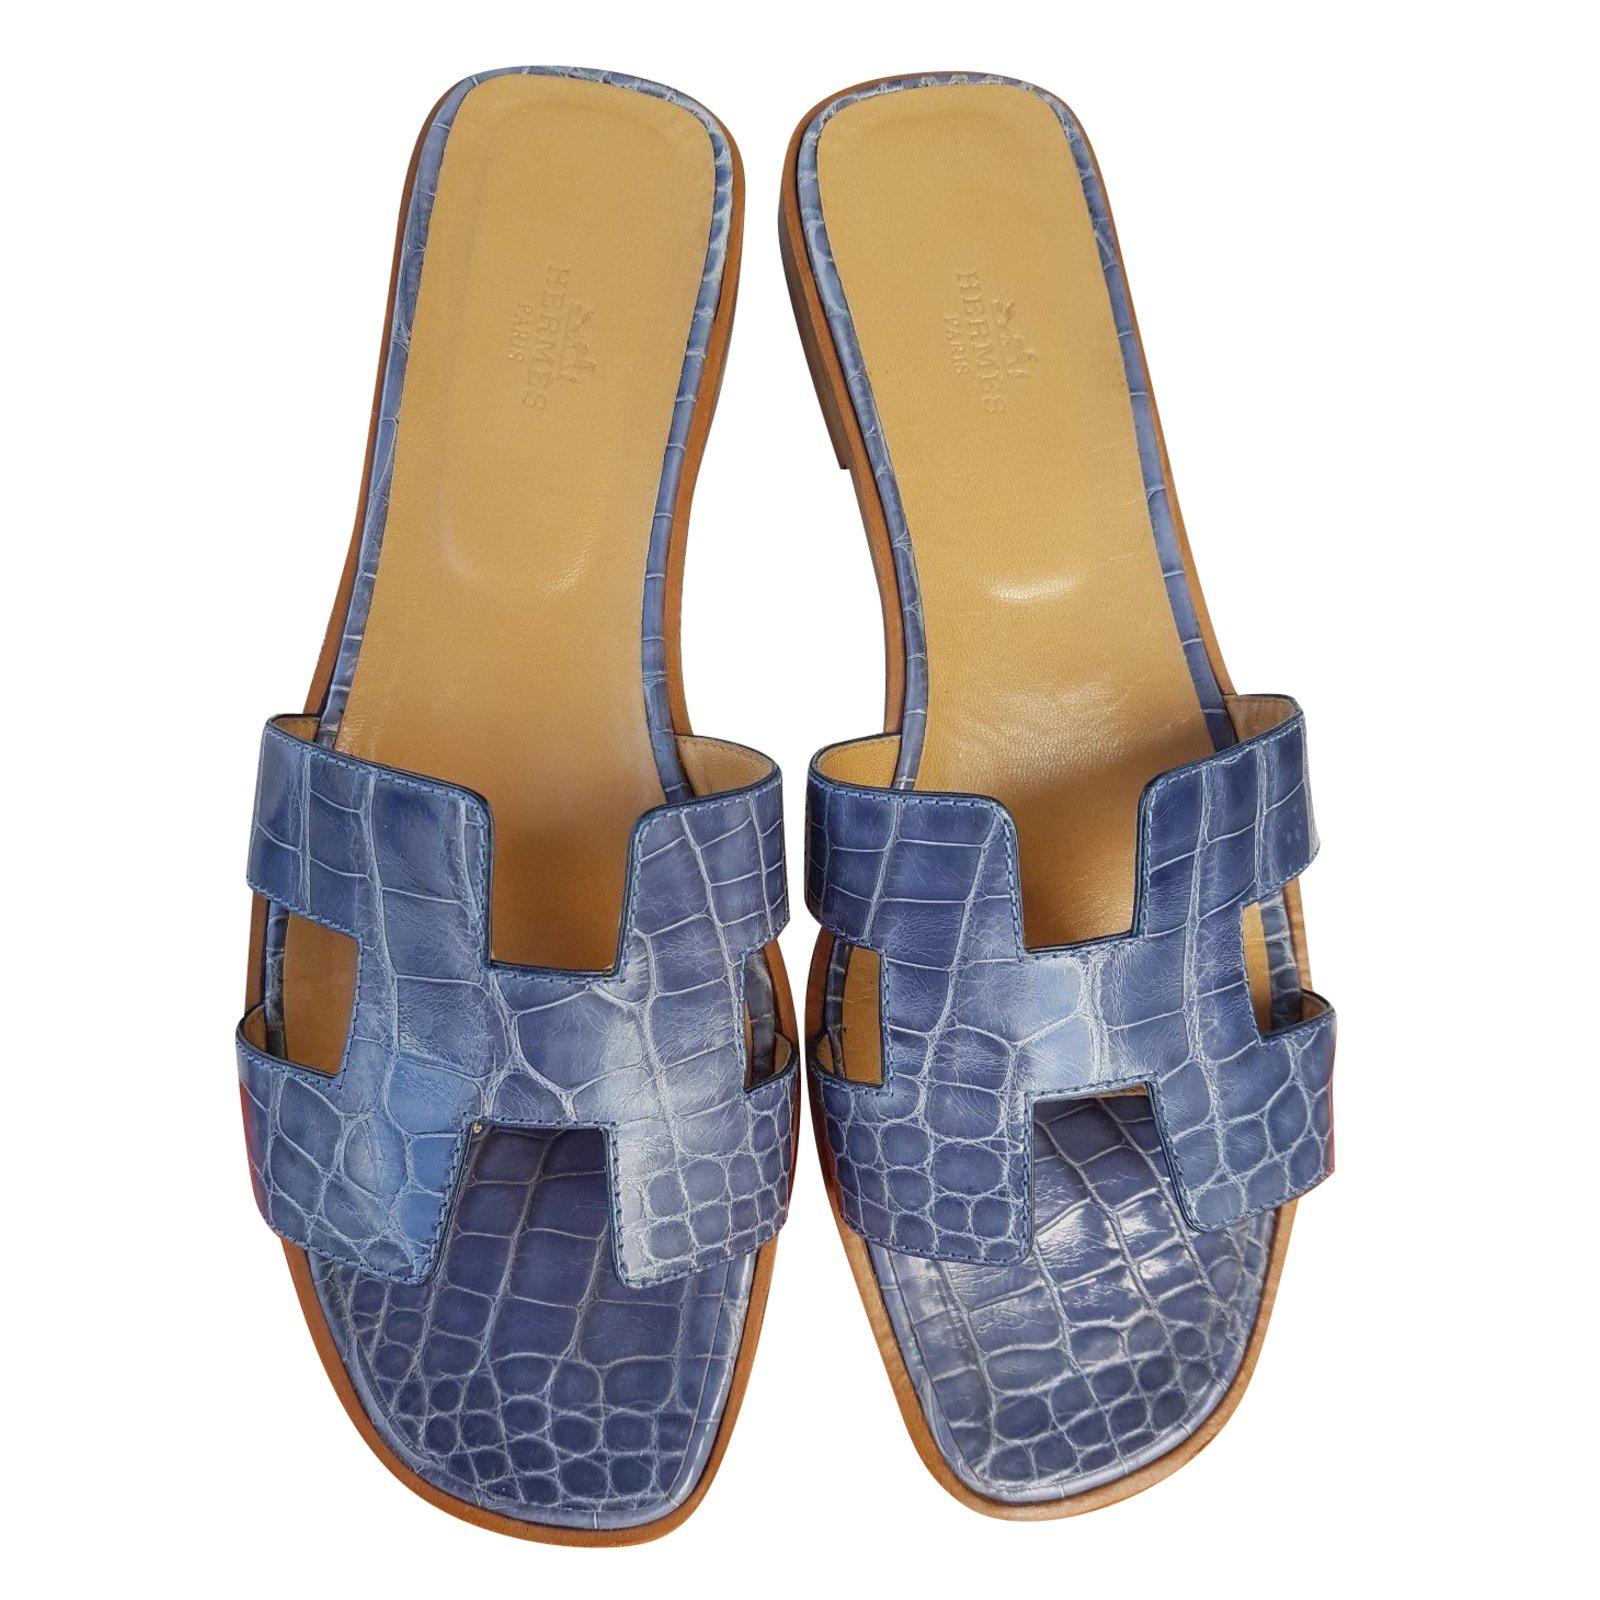 cheap sale new high quality Hermès Crocodile Oran Sandals outlet clearance store JlCsBwWM